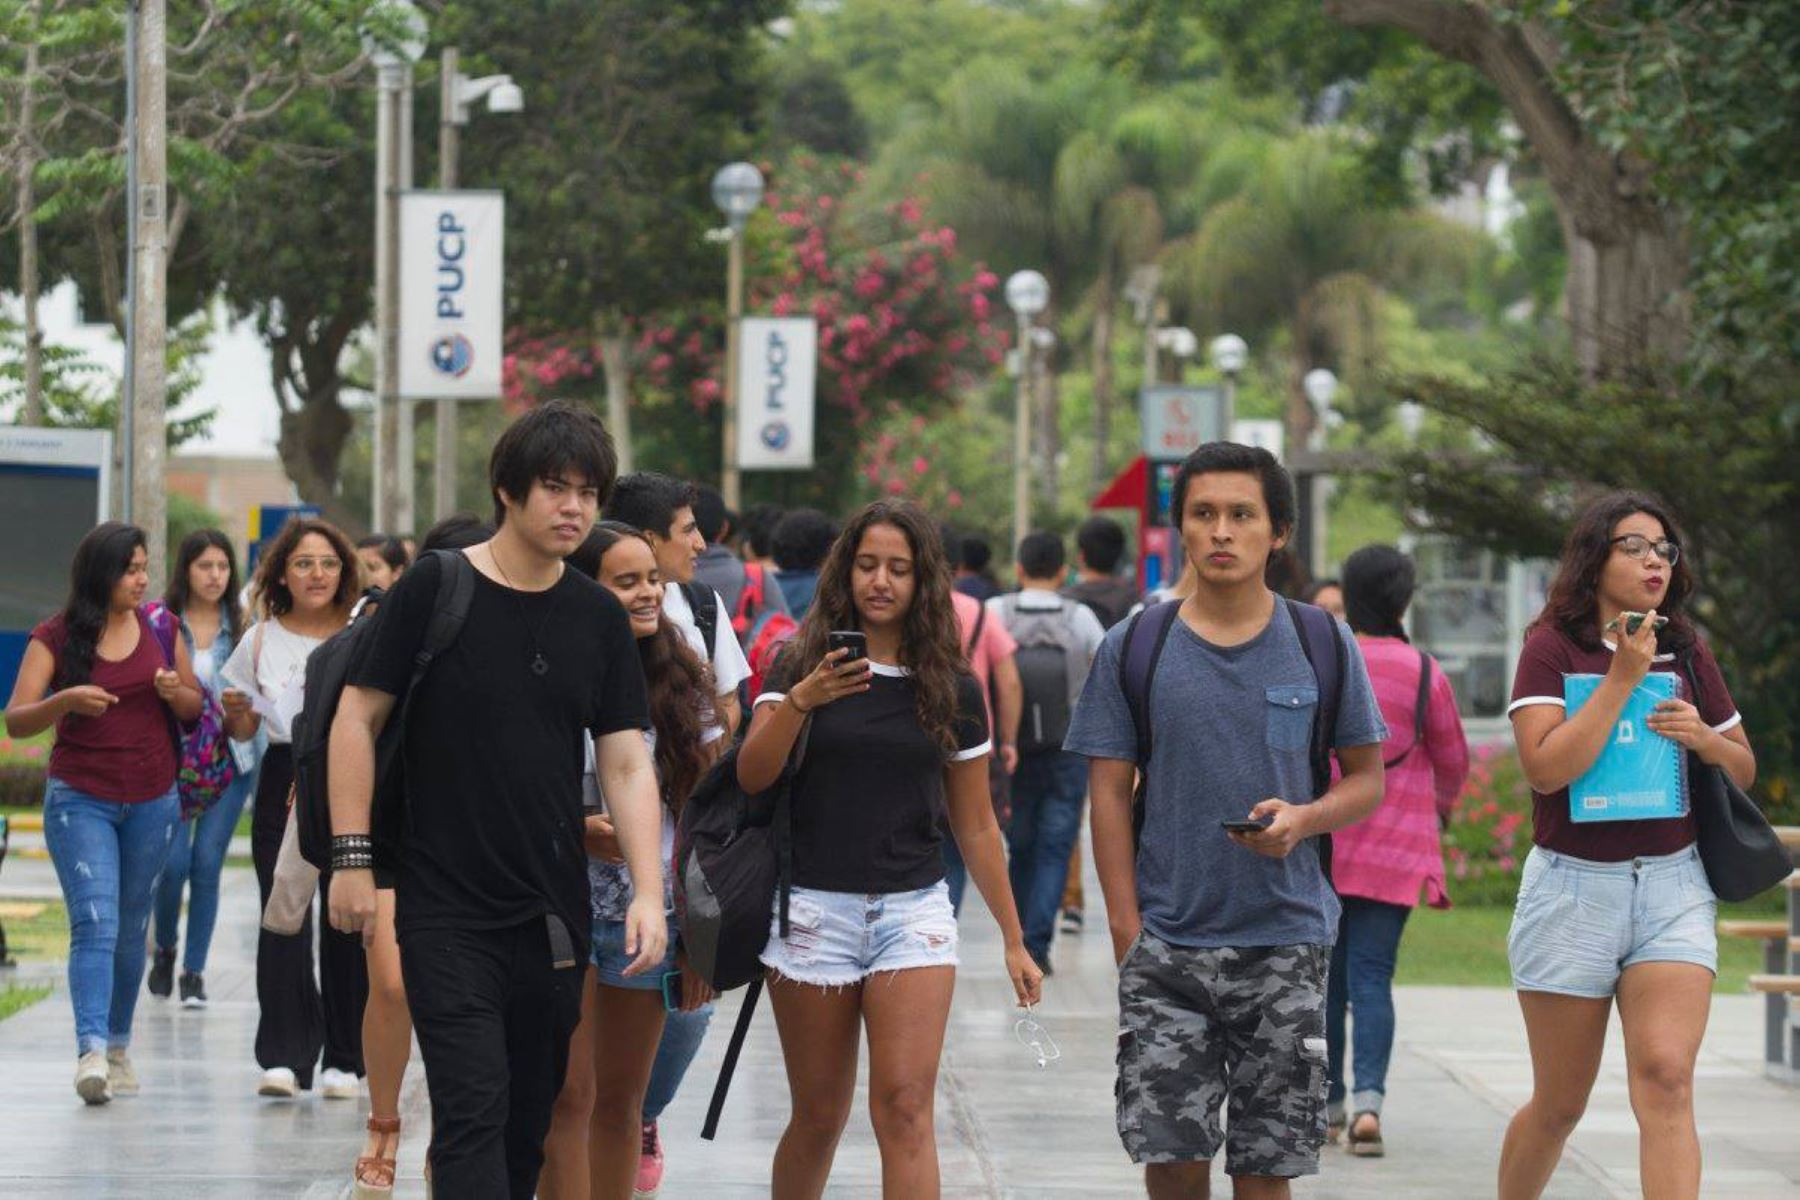 Universidades ecuatorianas figuran en ranking de las mejores de América Latina